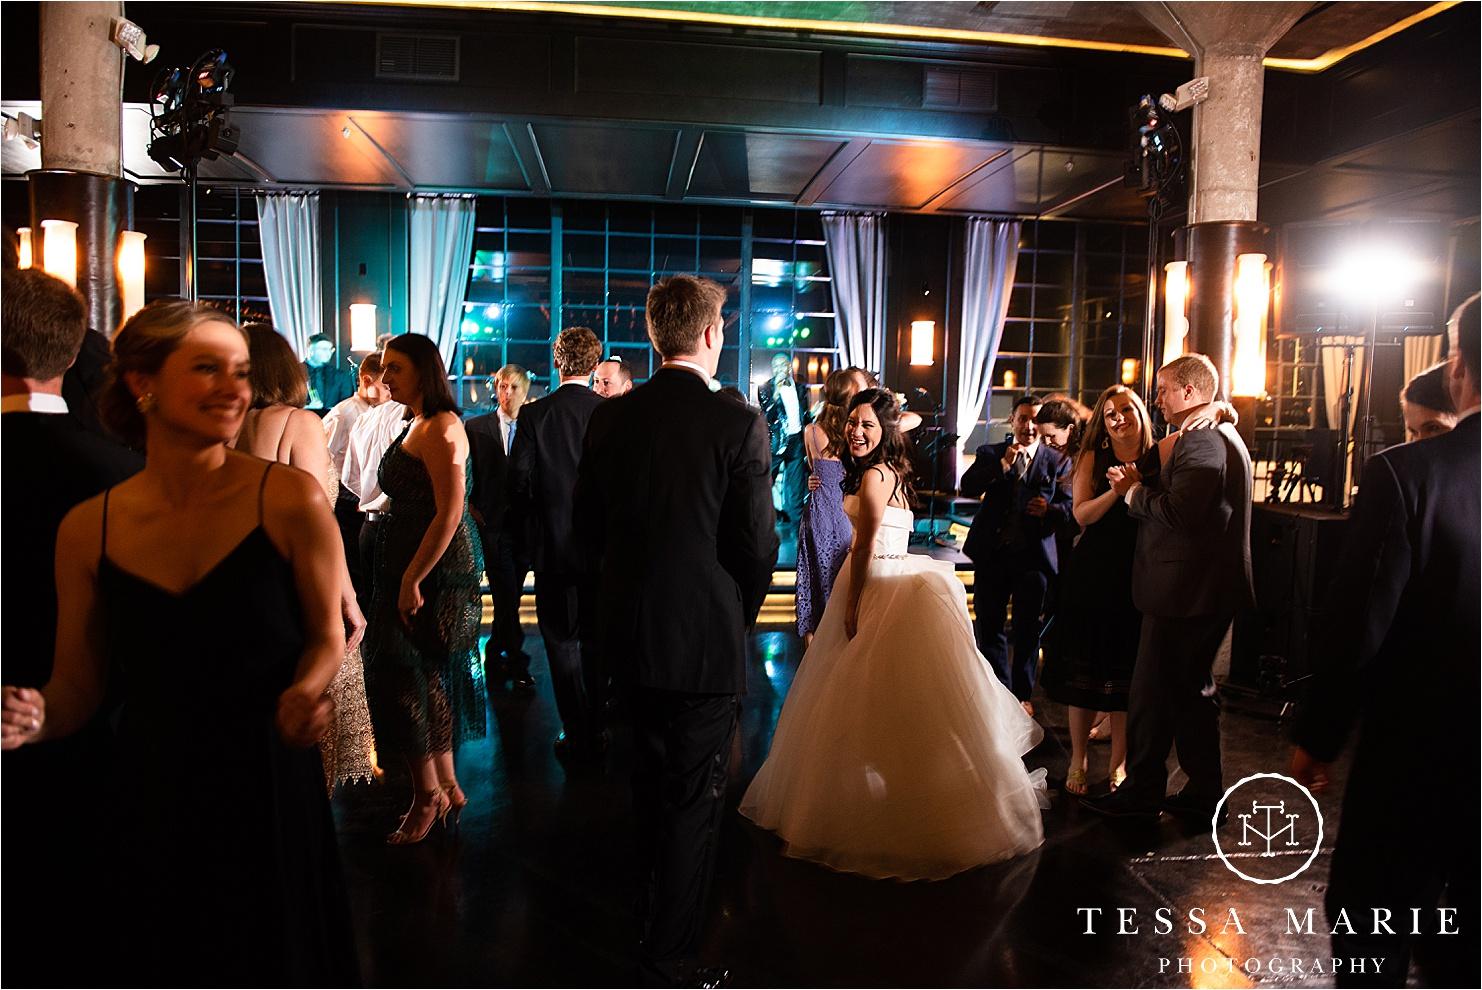 Tessa_marie_weddings_houston_wedding_photographer_The_astorian_0175.jpg